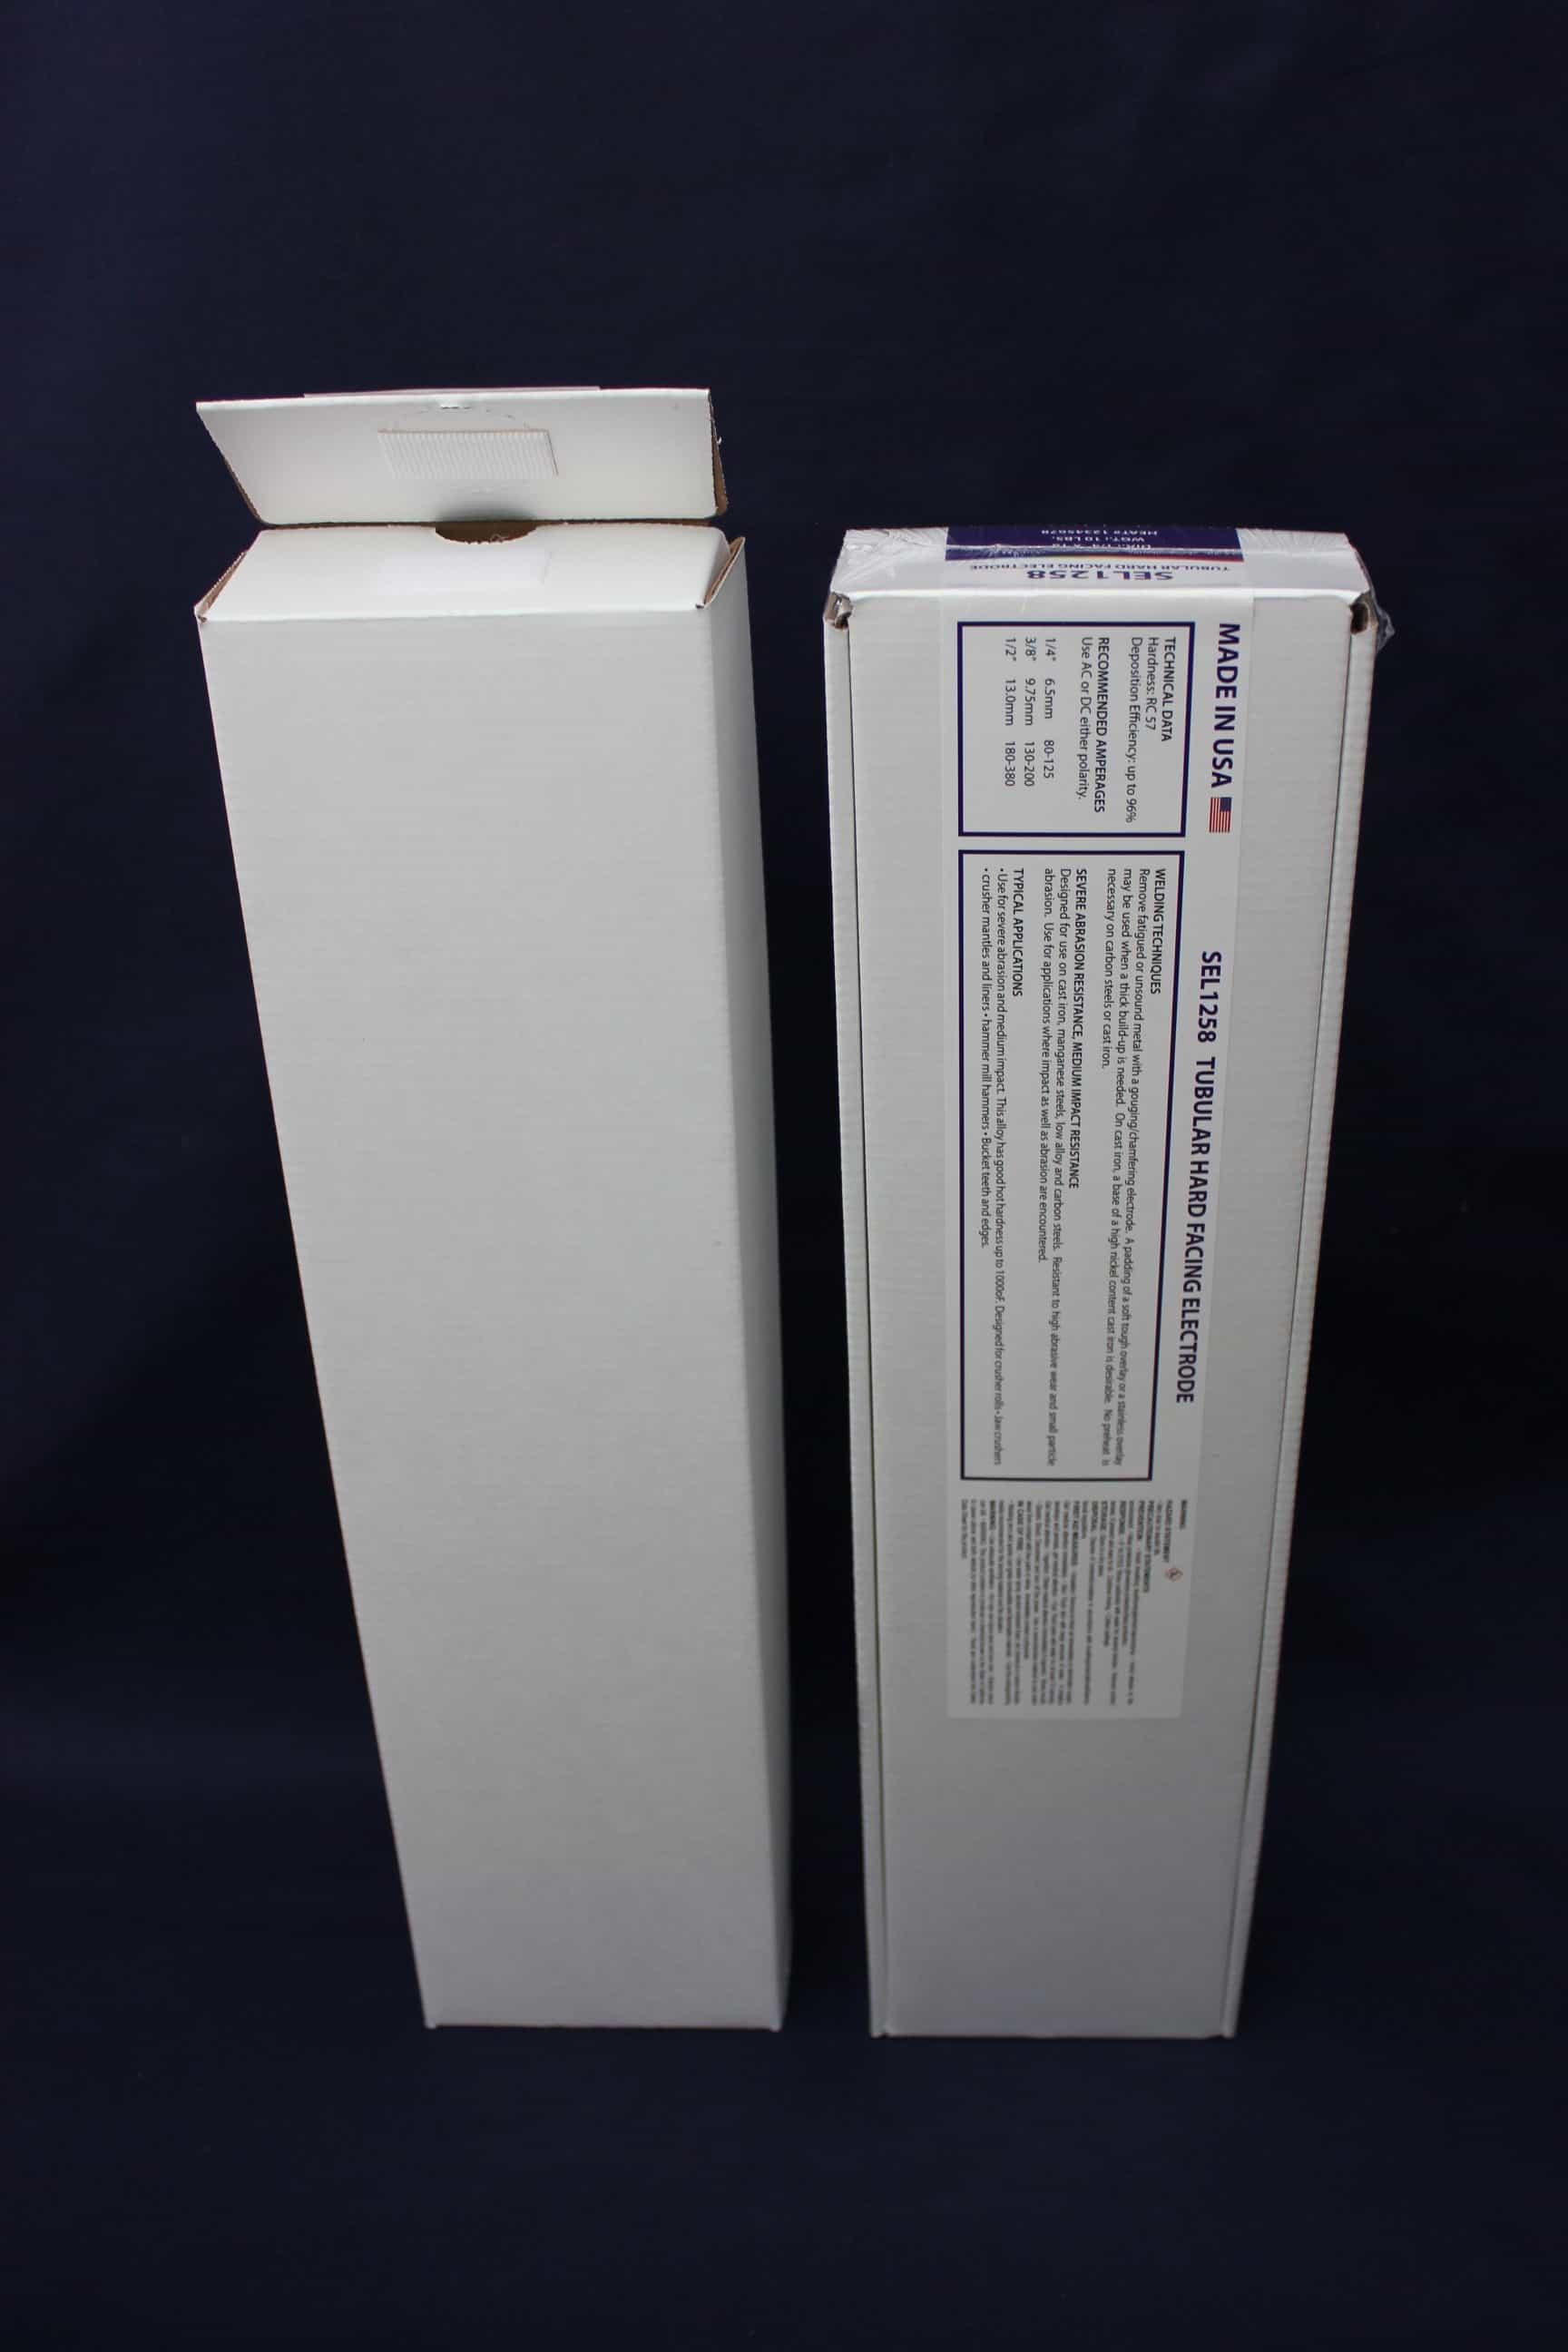 Dri-Box Safe Cardboard Packaging